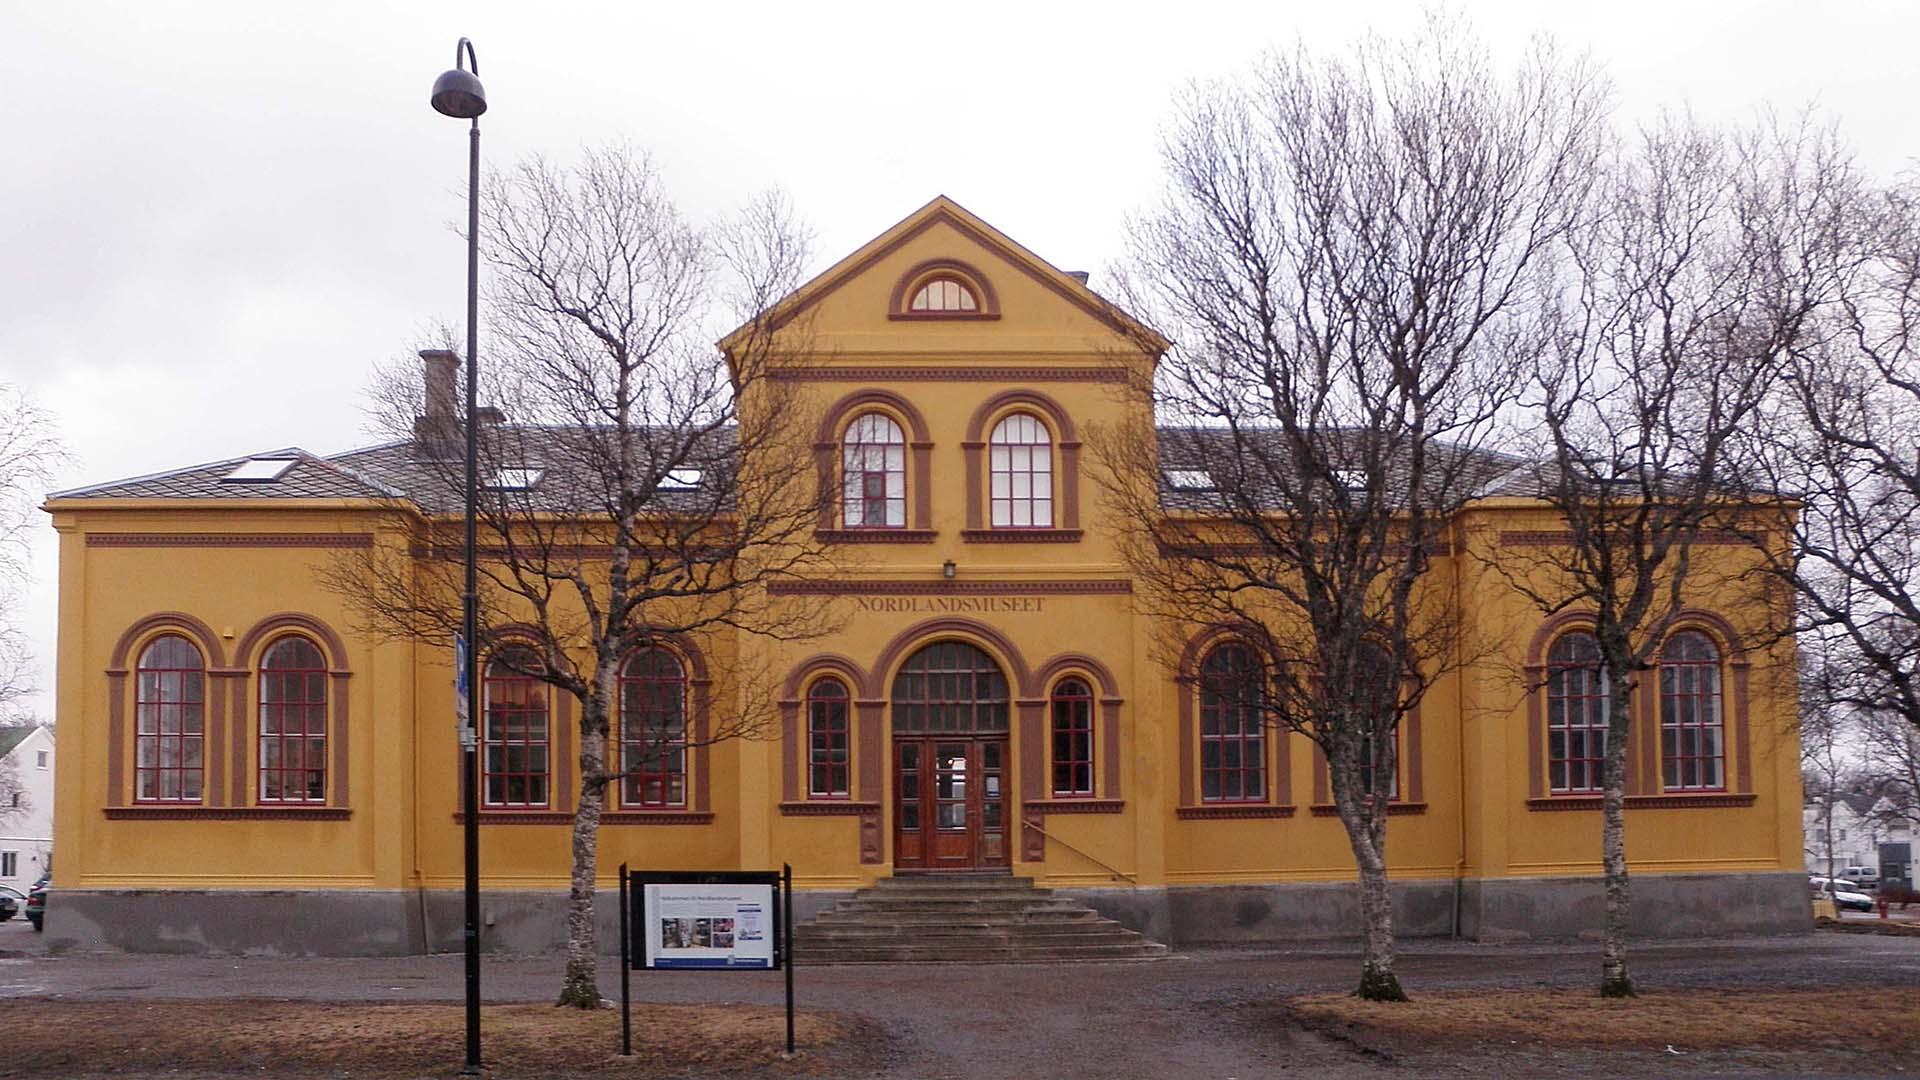 Nordlandsmuseet Prinsensgt. 116. Foto: Manxruler Wikimedia Commons CC BY-SA 3.0